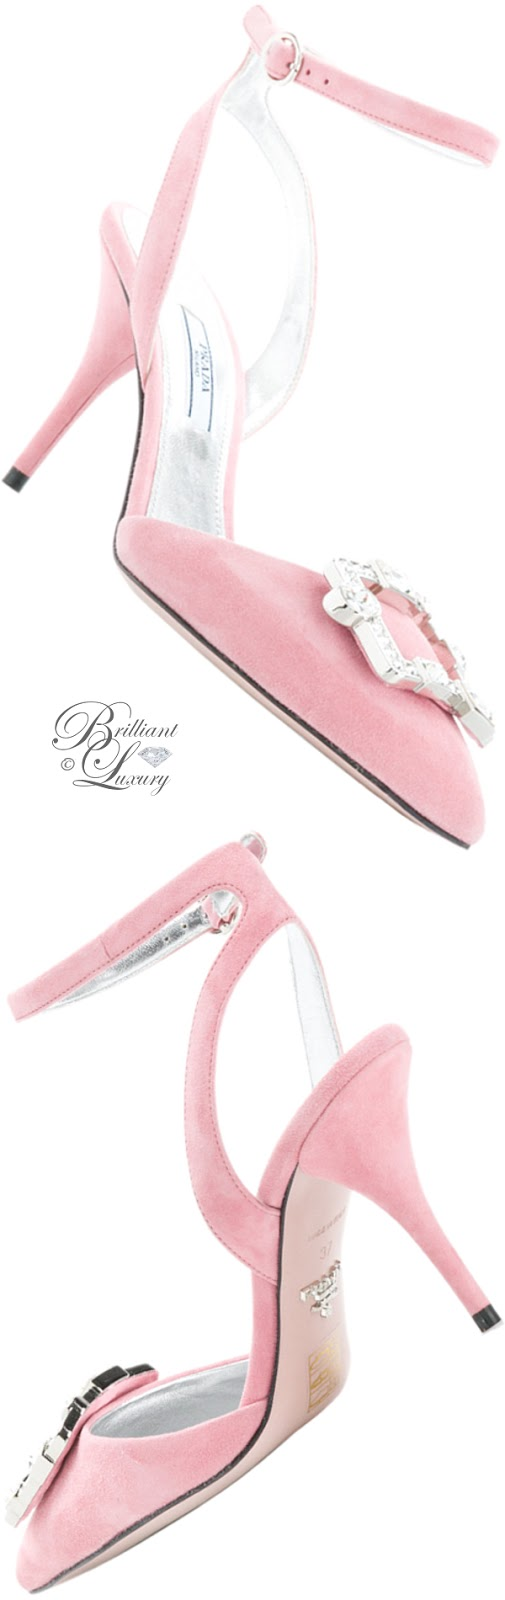 Brilliant Luxury ♦ Prada pointed rhinestone pumps